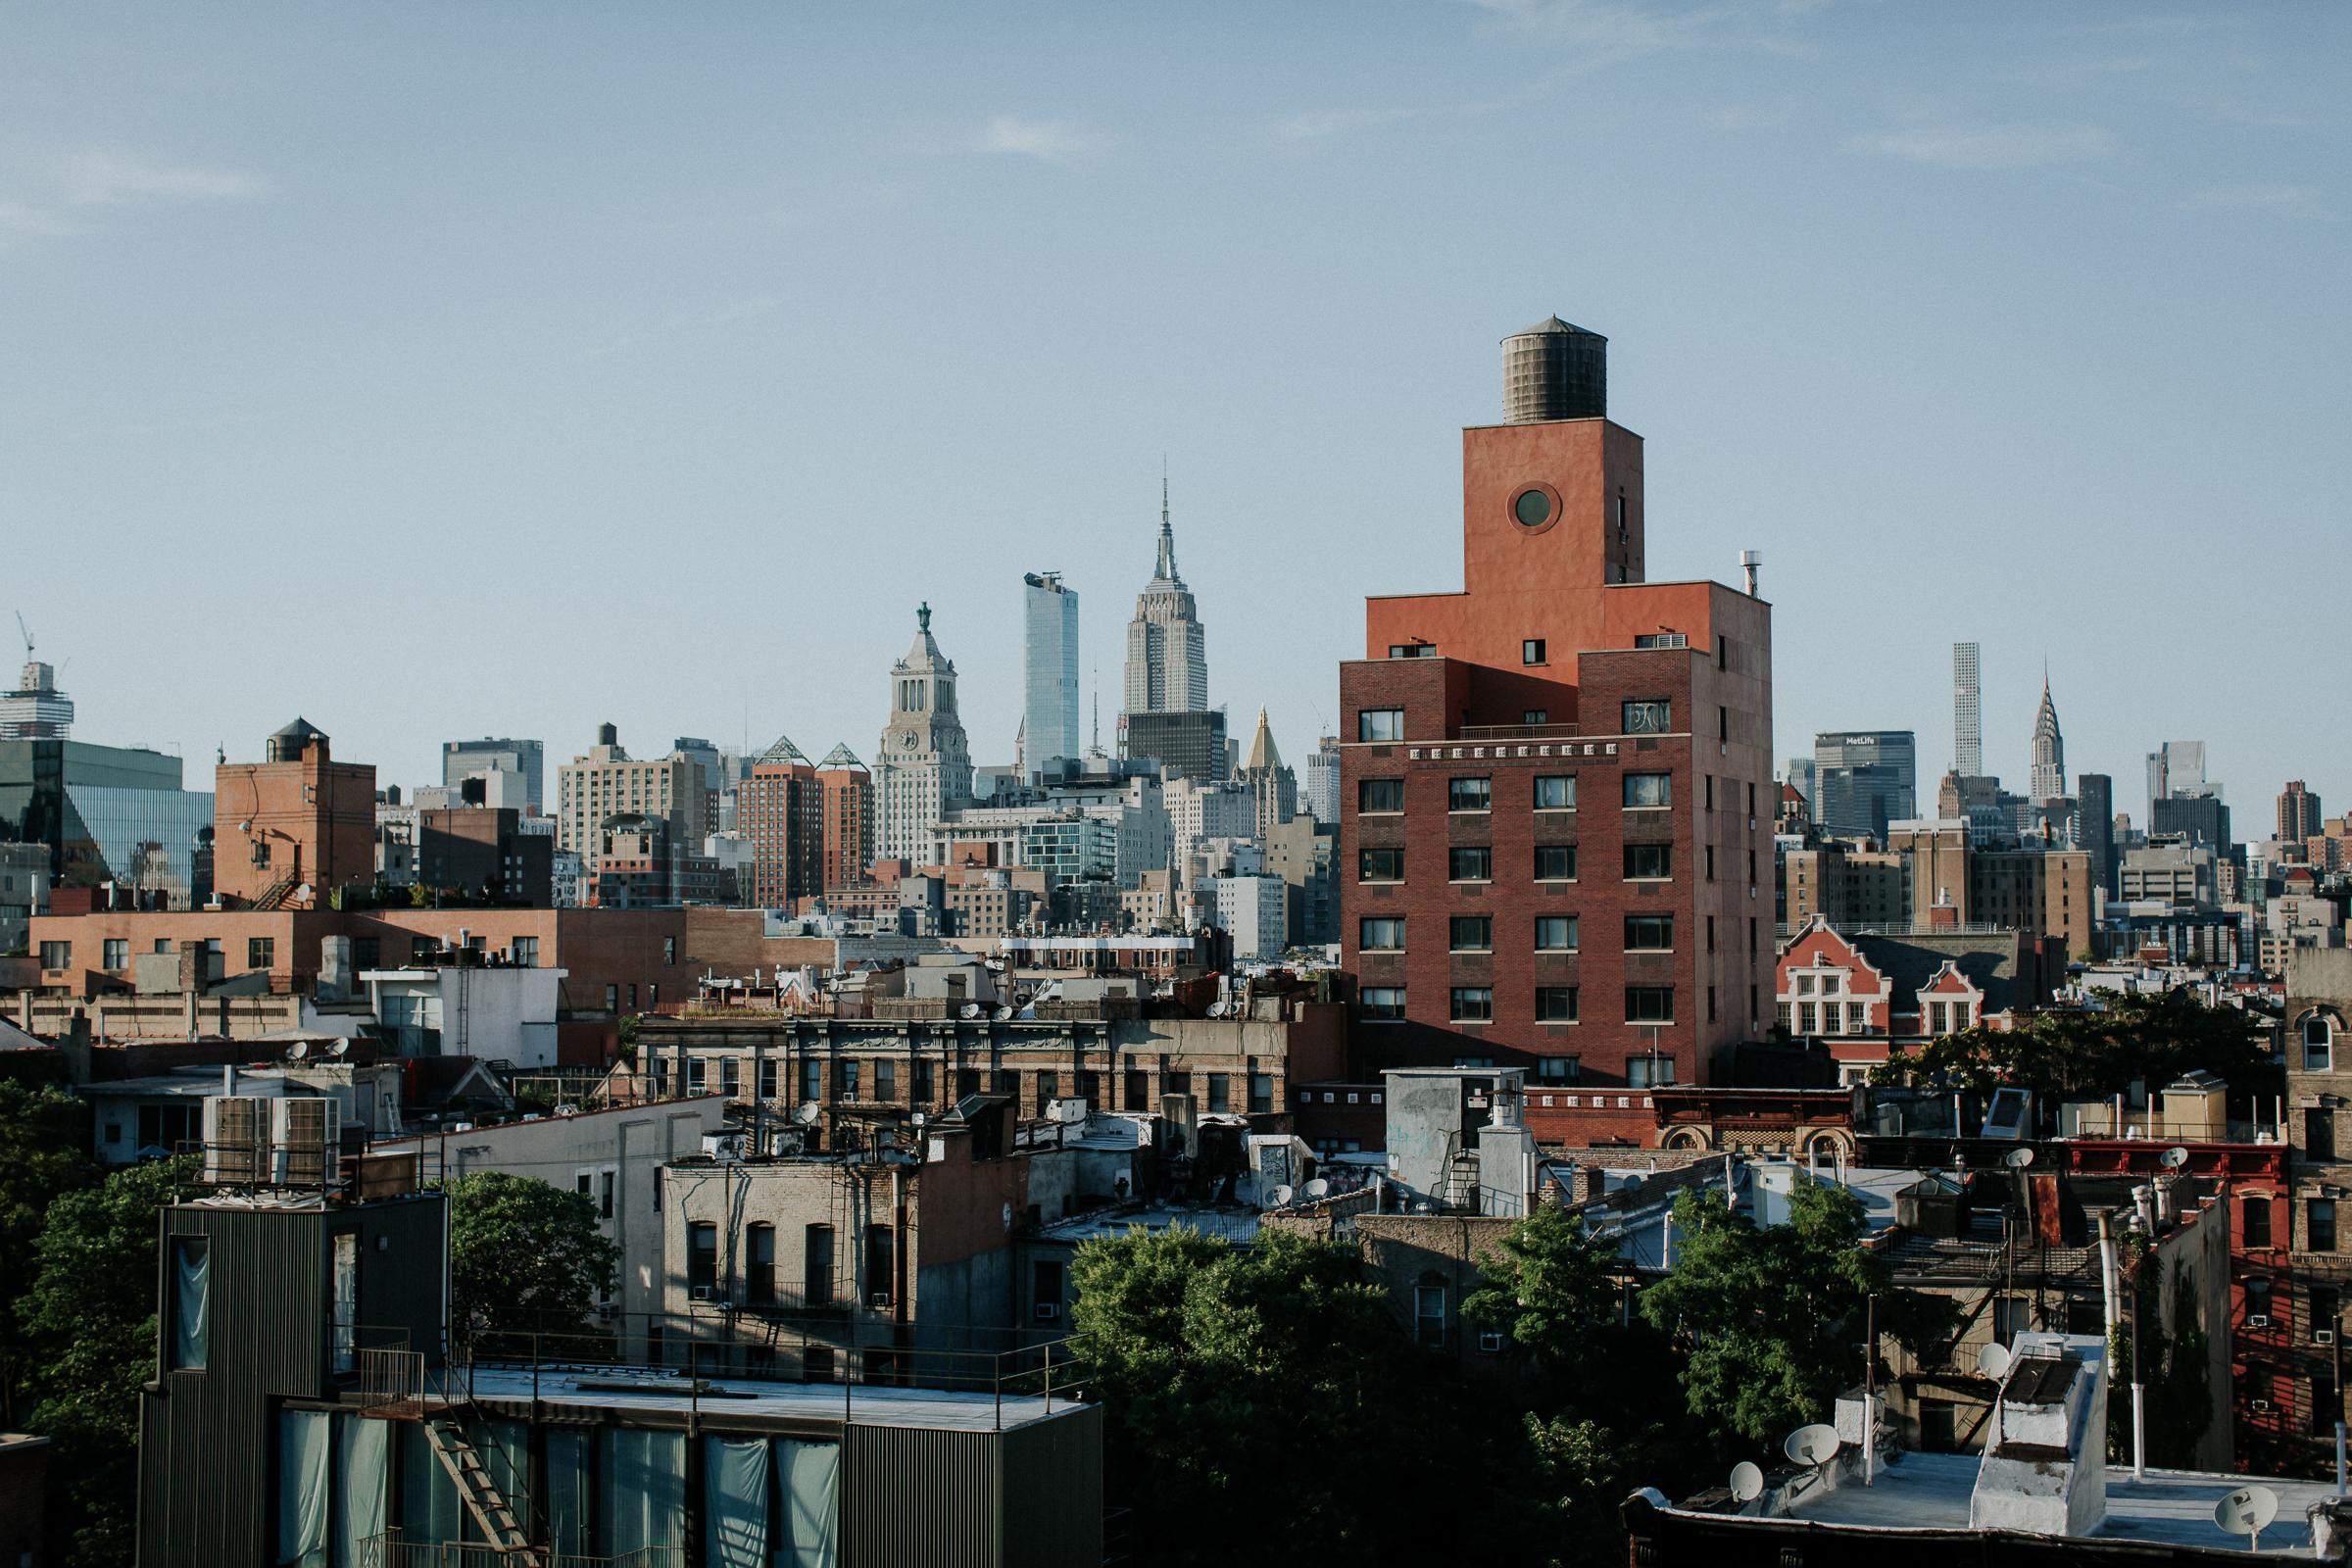 The-Bhakti-Center-Yoga-NYC-Rooftop-Documentary-Wedding-Photographer-41.jpg